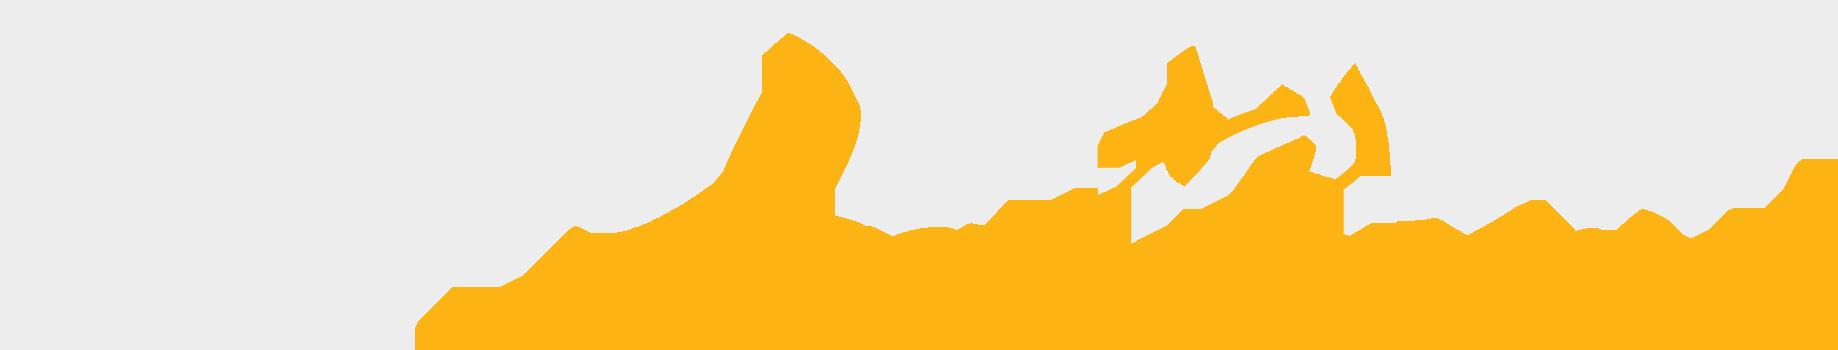 LBLB Wordmark